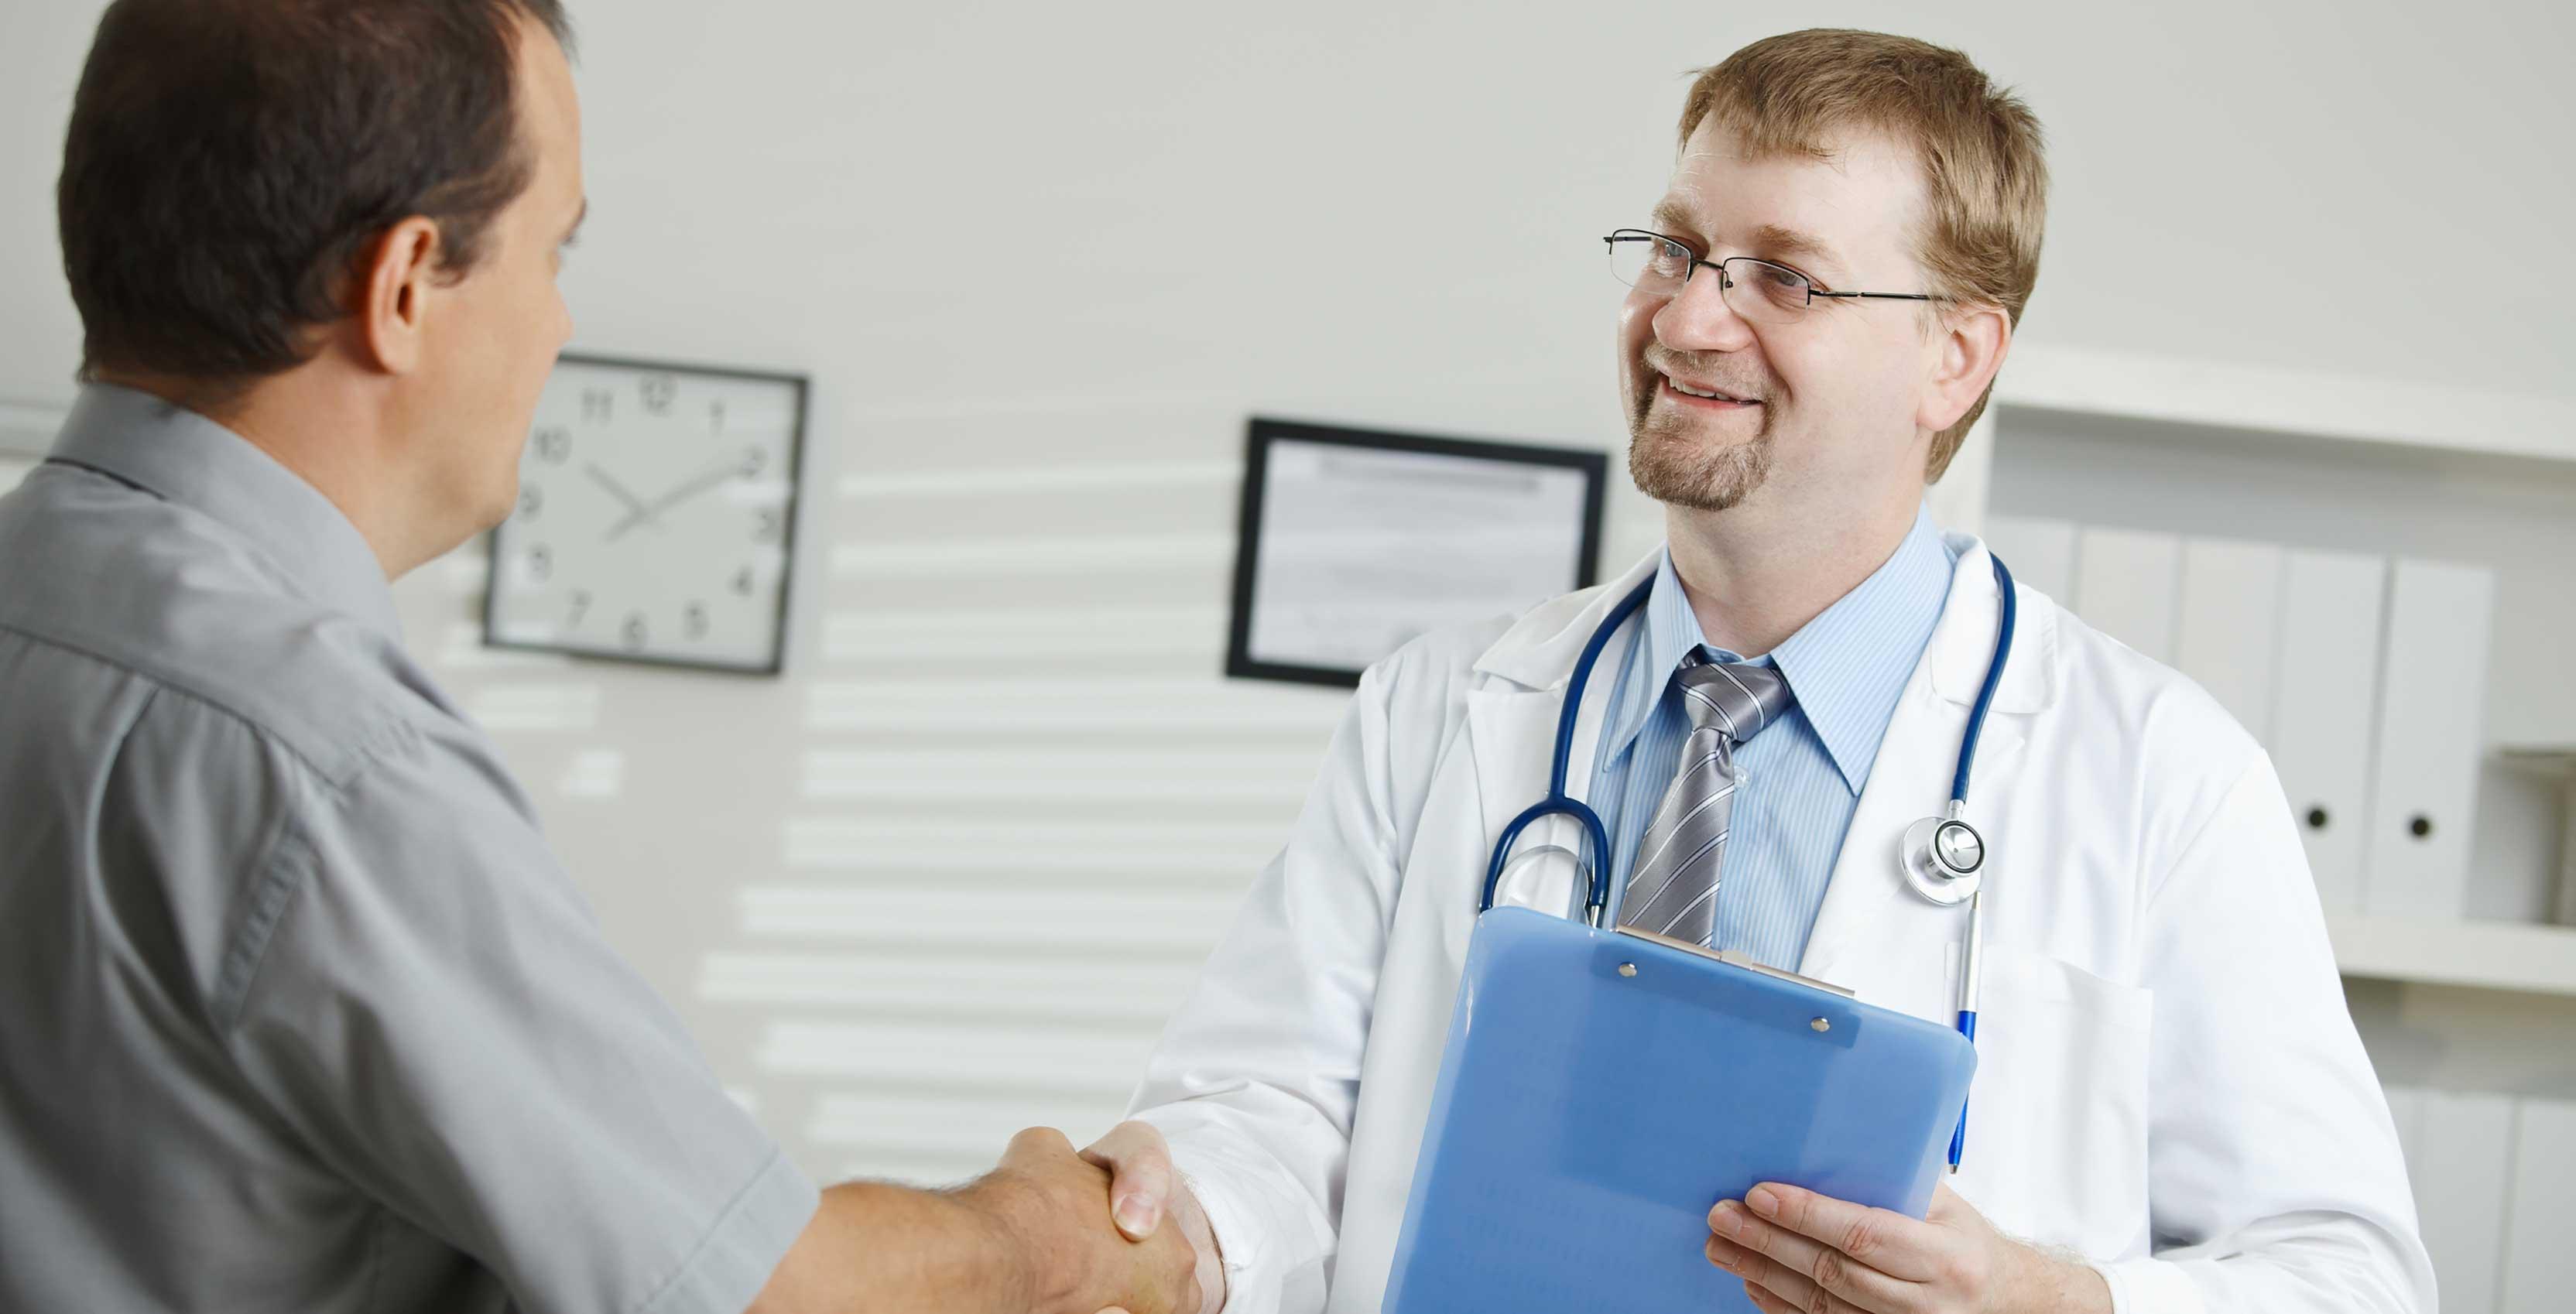 Doctor shaking patient's hand